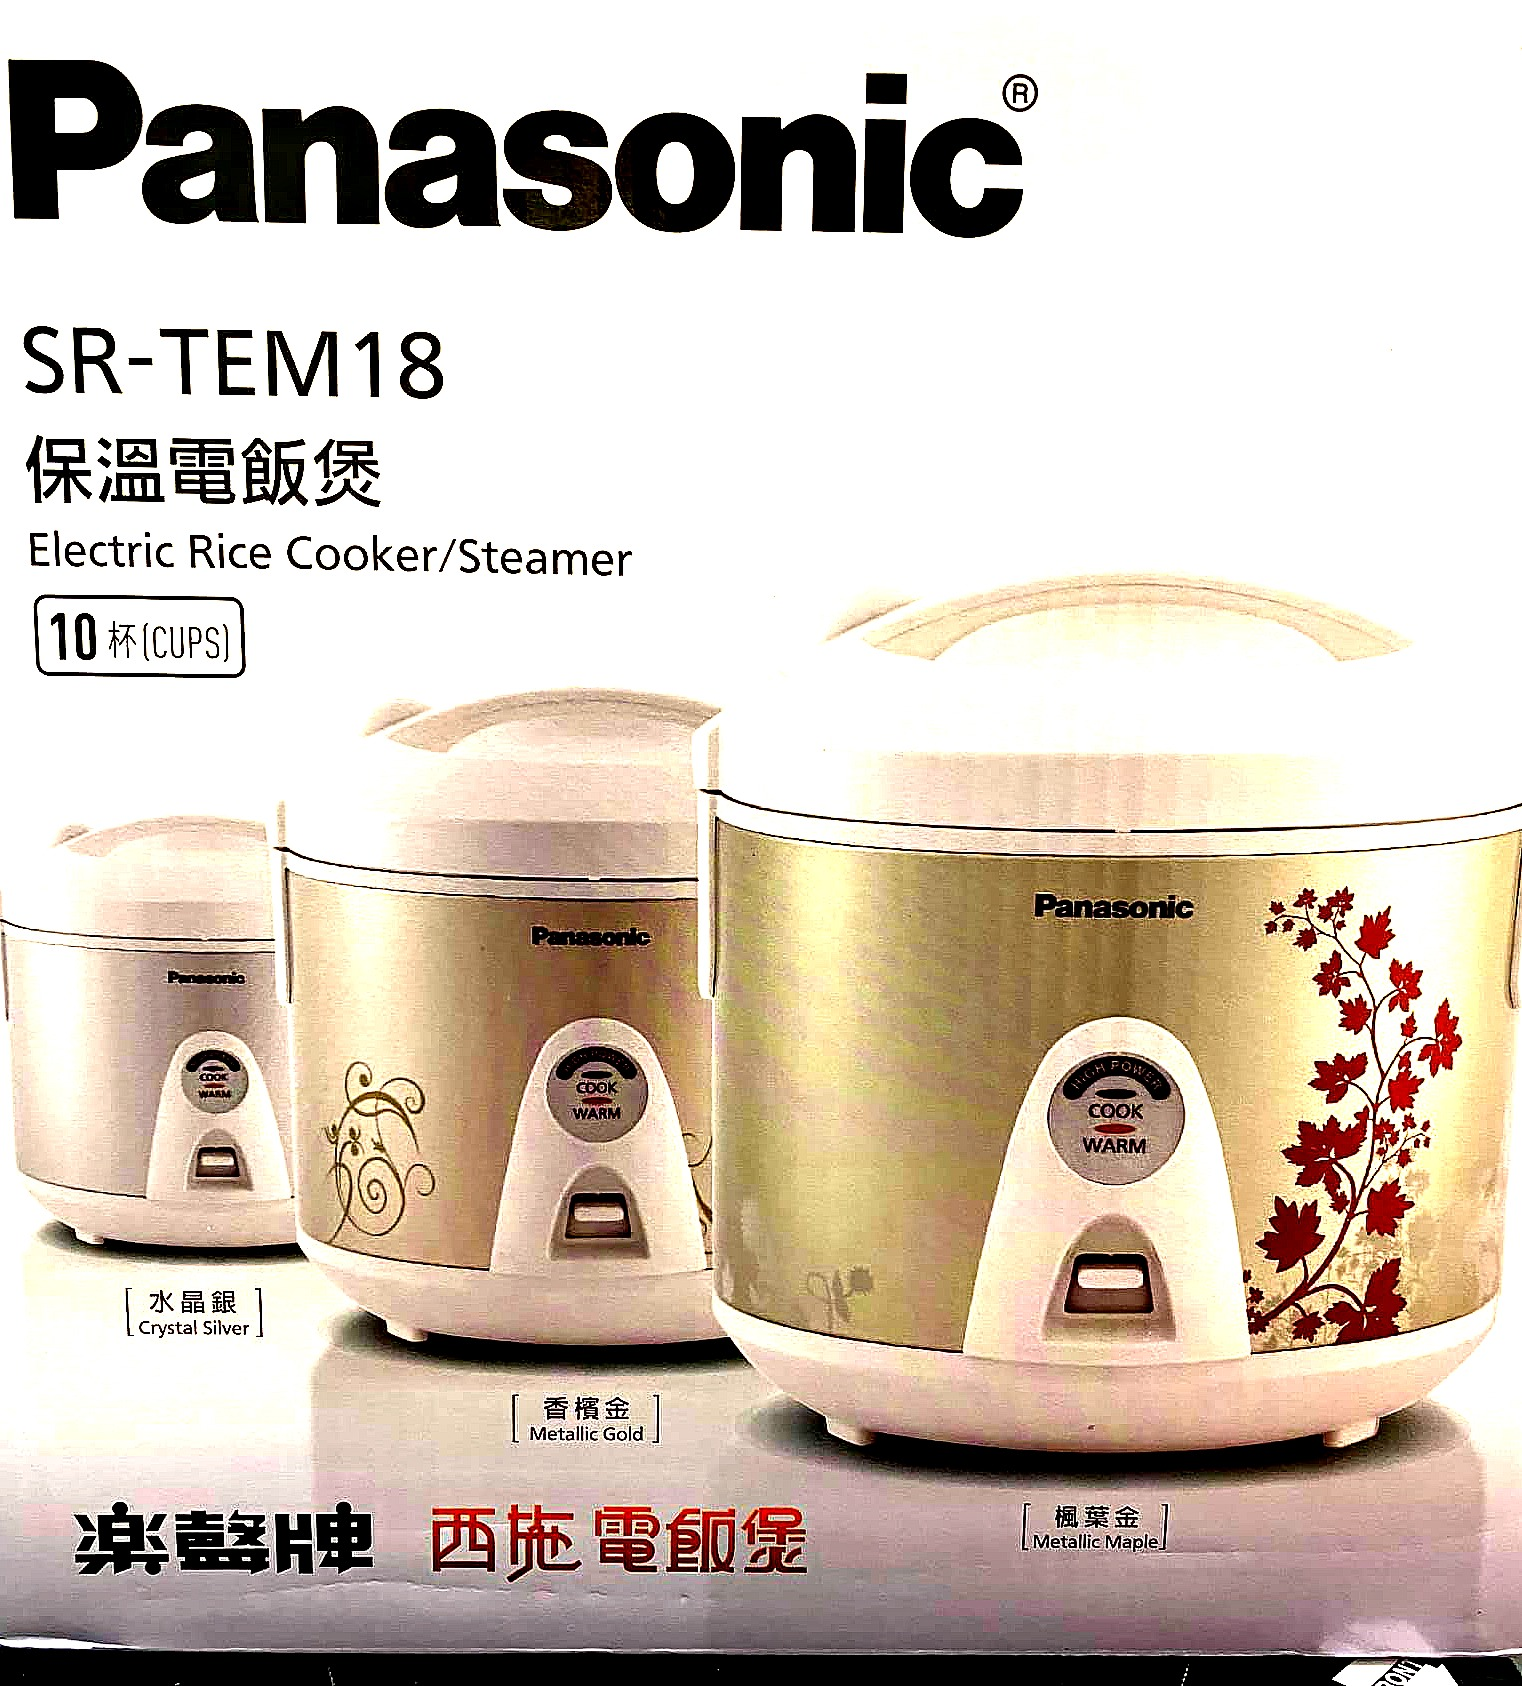 Rice Cooker & Streamer 1,8L Panasonic